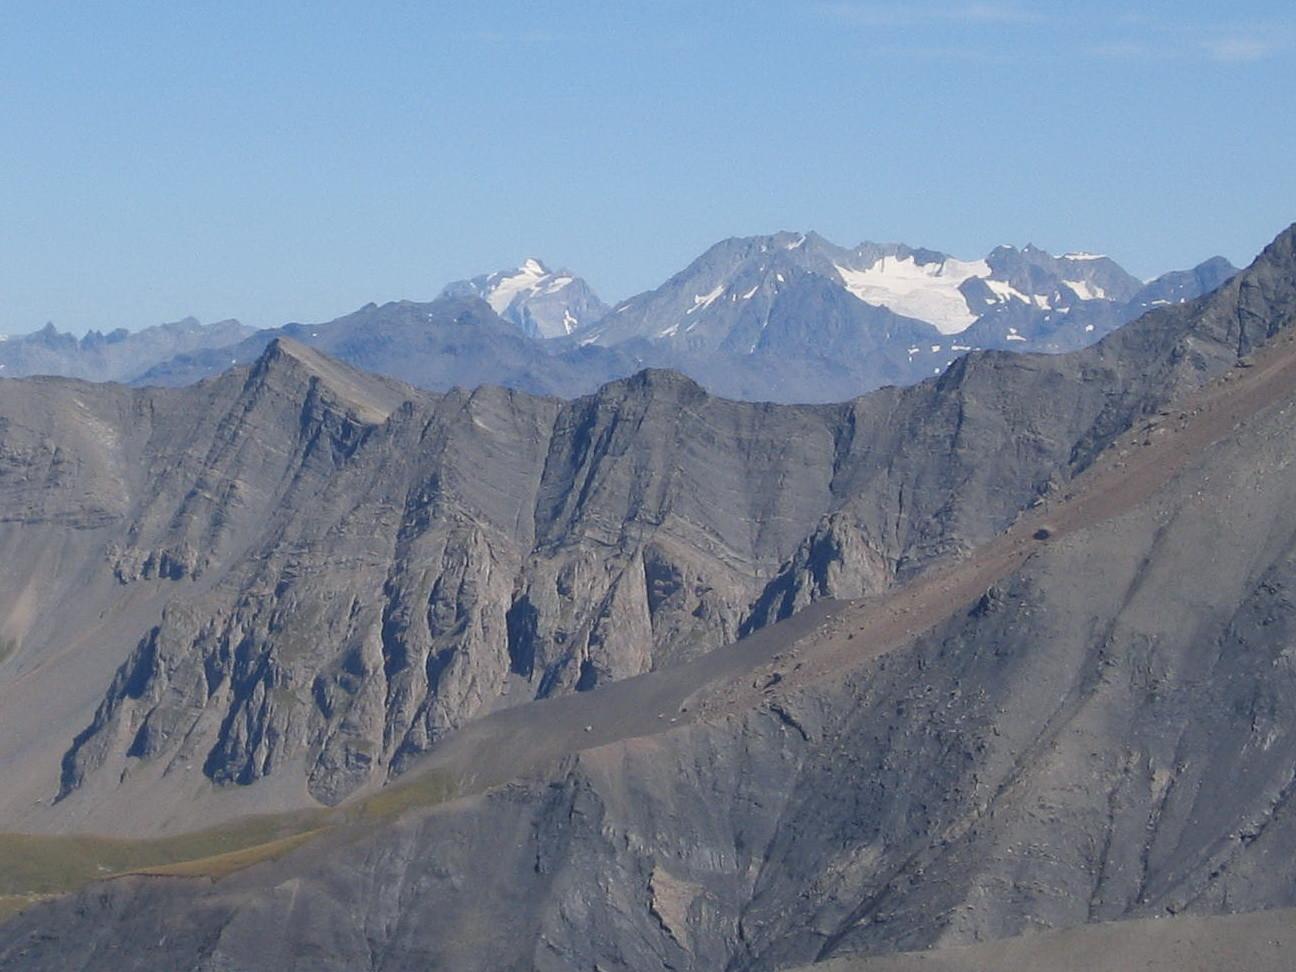 la grande Casse et Péclet Polset, du sommet